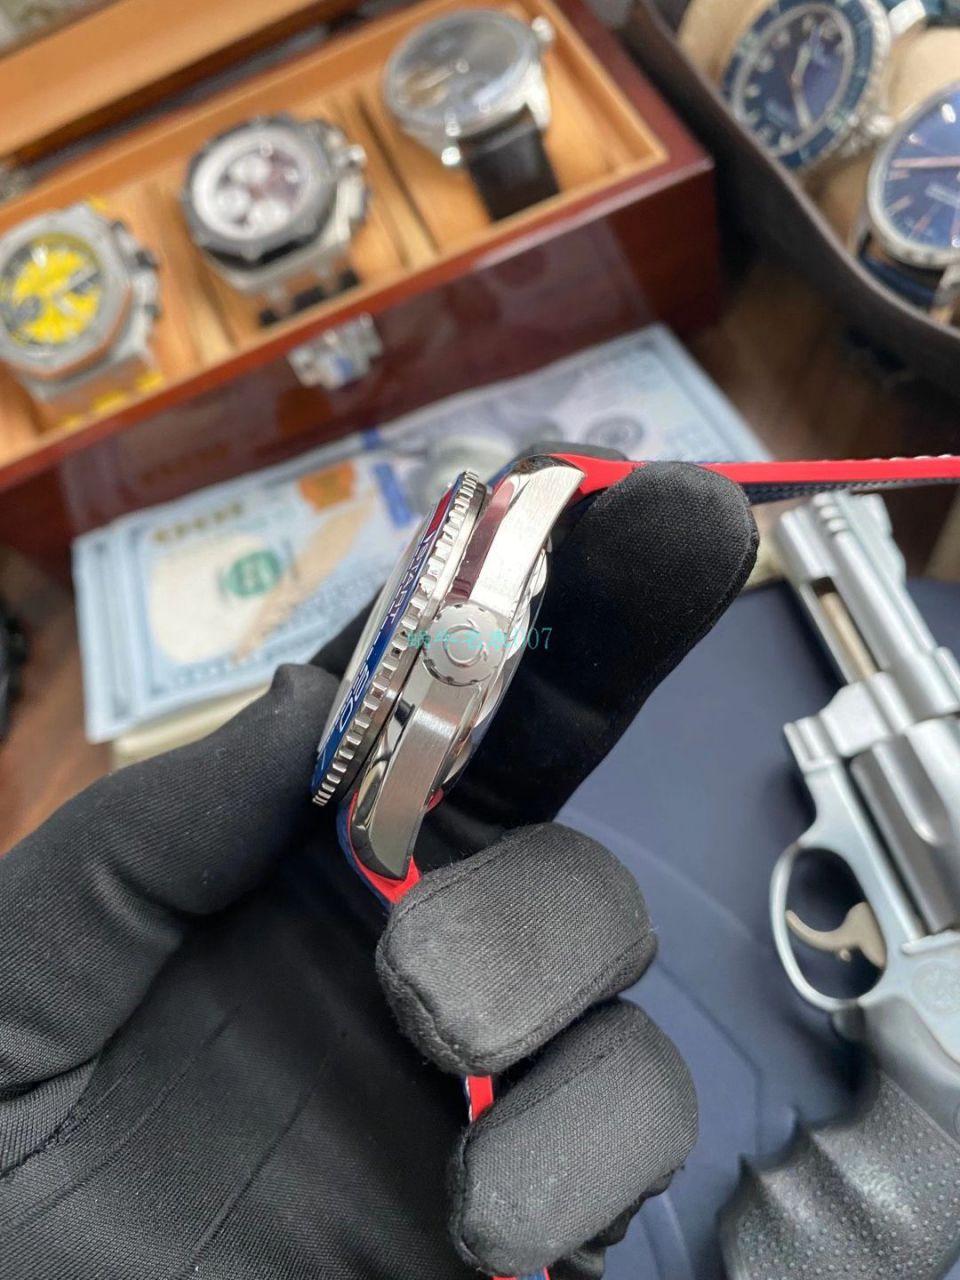 VS厂1比1高仿手表欧米茄海马系列海洋宇宙美洲杯限量版腕表 / VS733